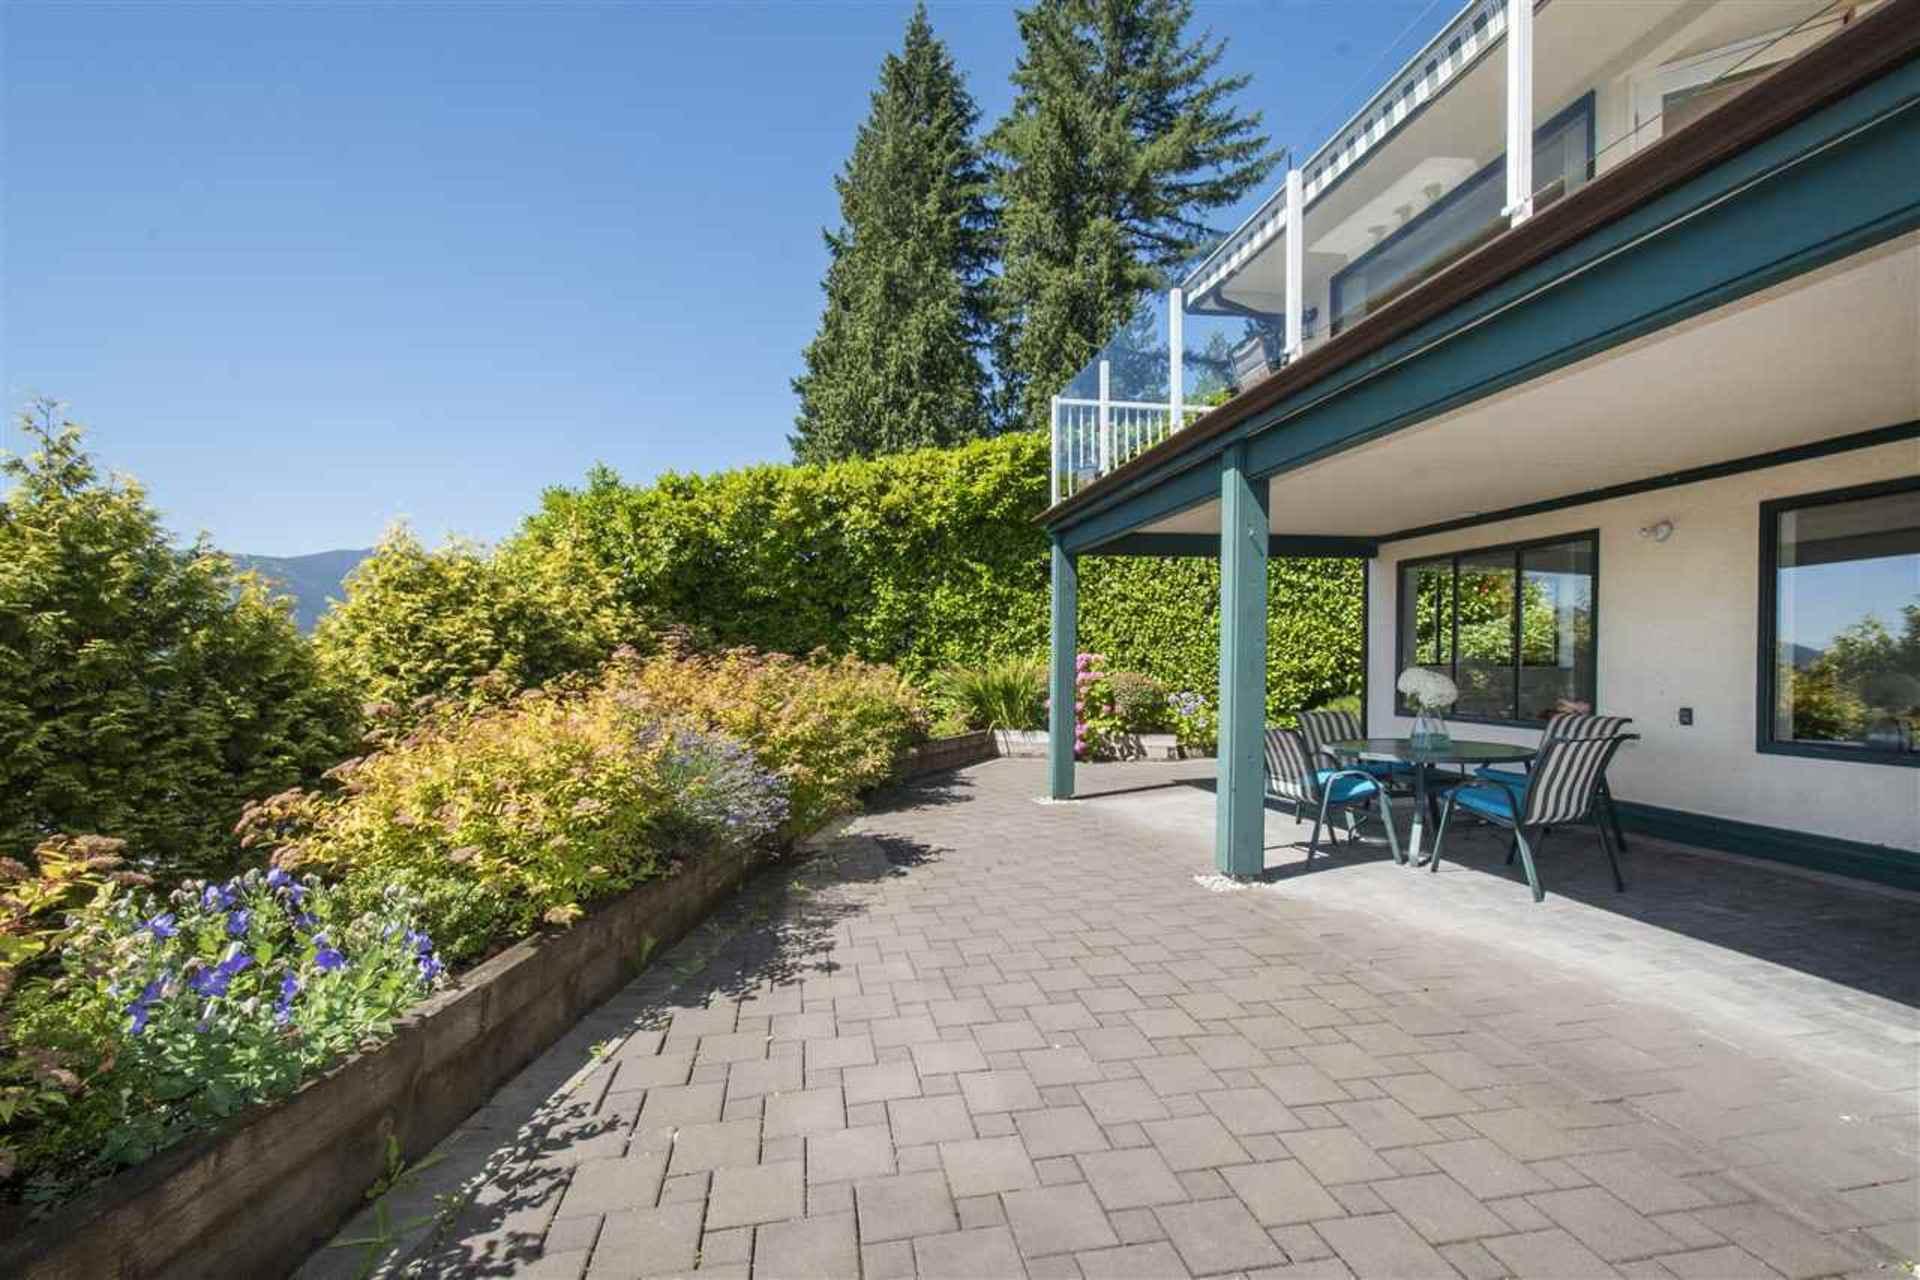 4285-prospect-road-upper-delbrook-north-vancouver-33 at 4285 Prospect Road, Upper Delbrook, North Vancouver